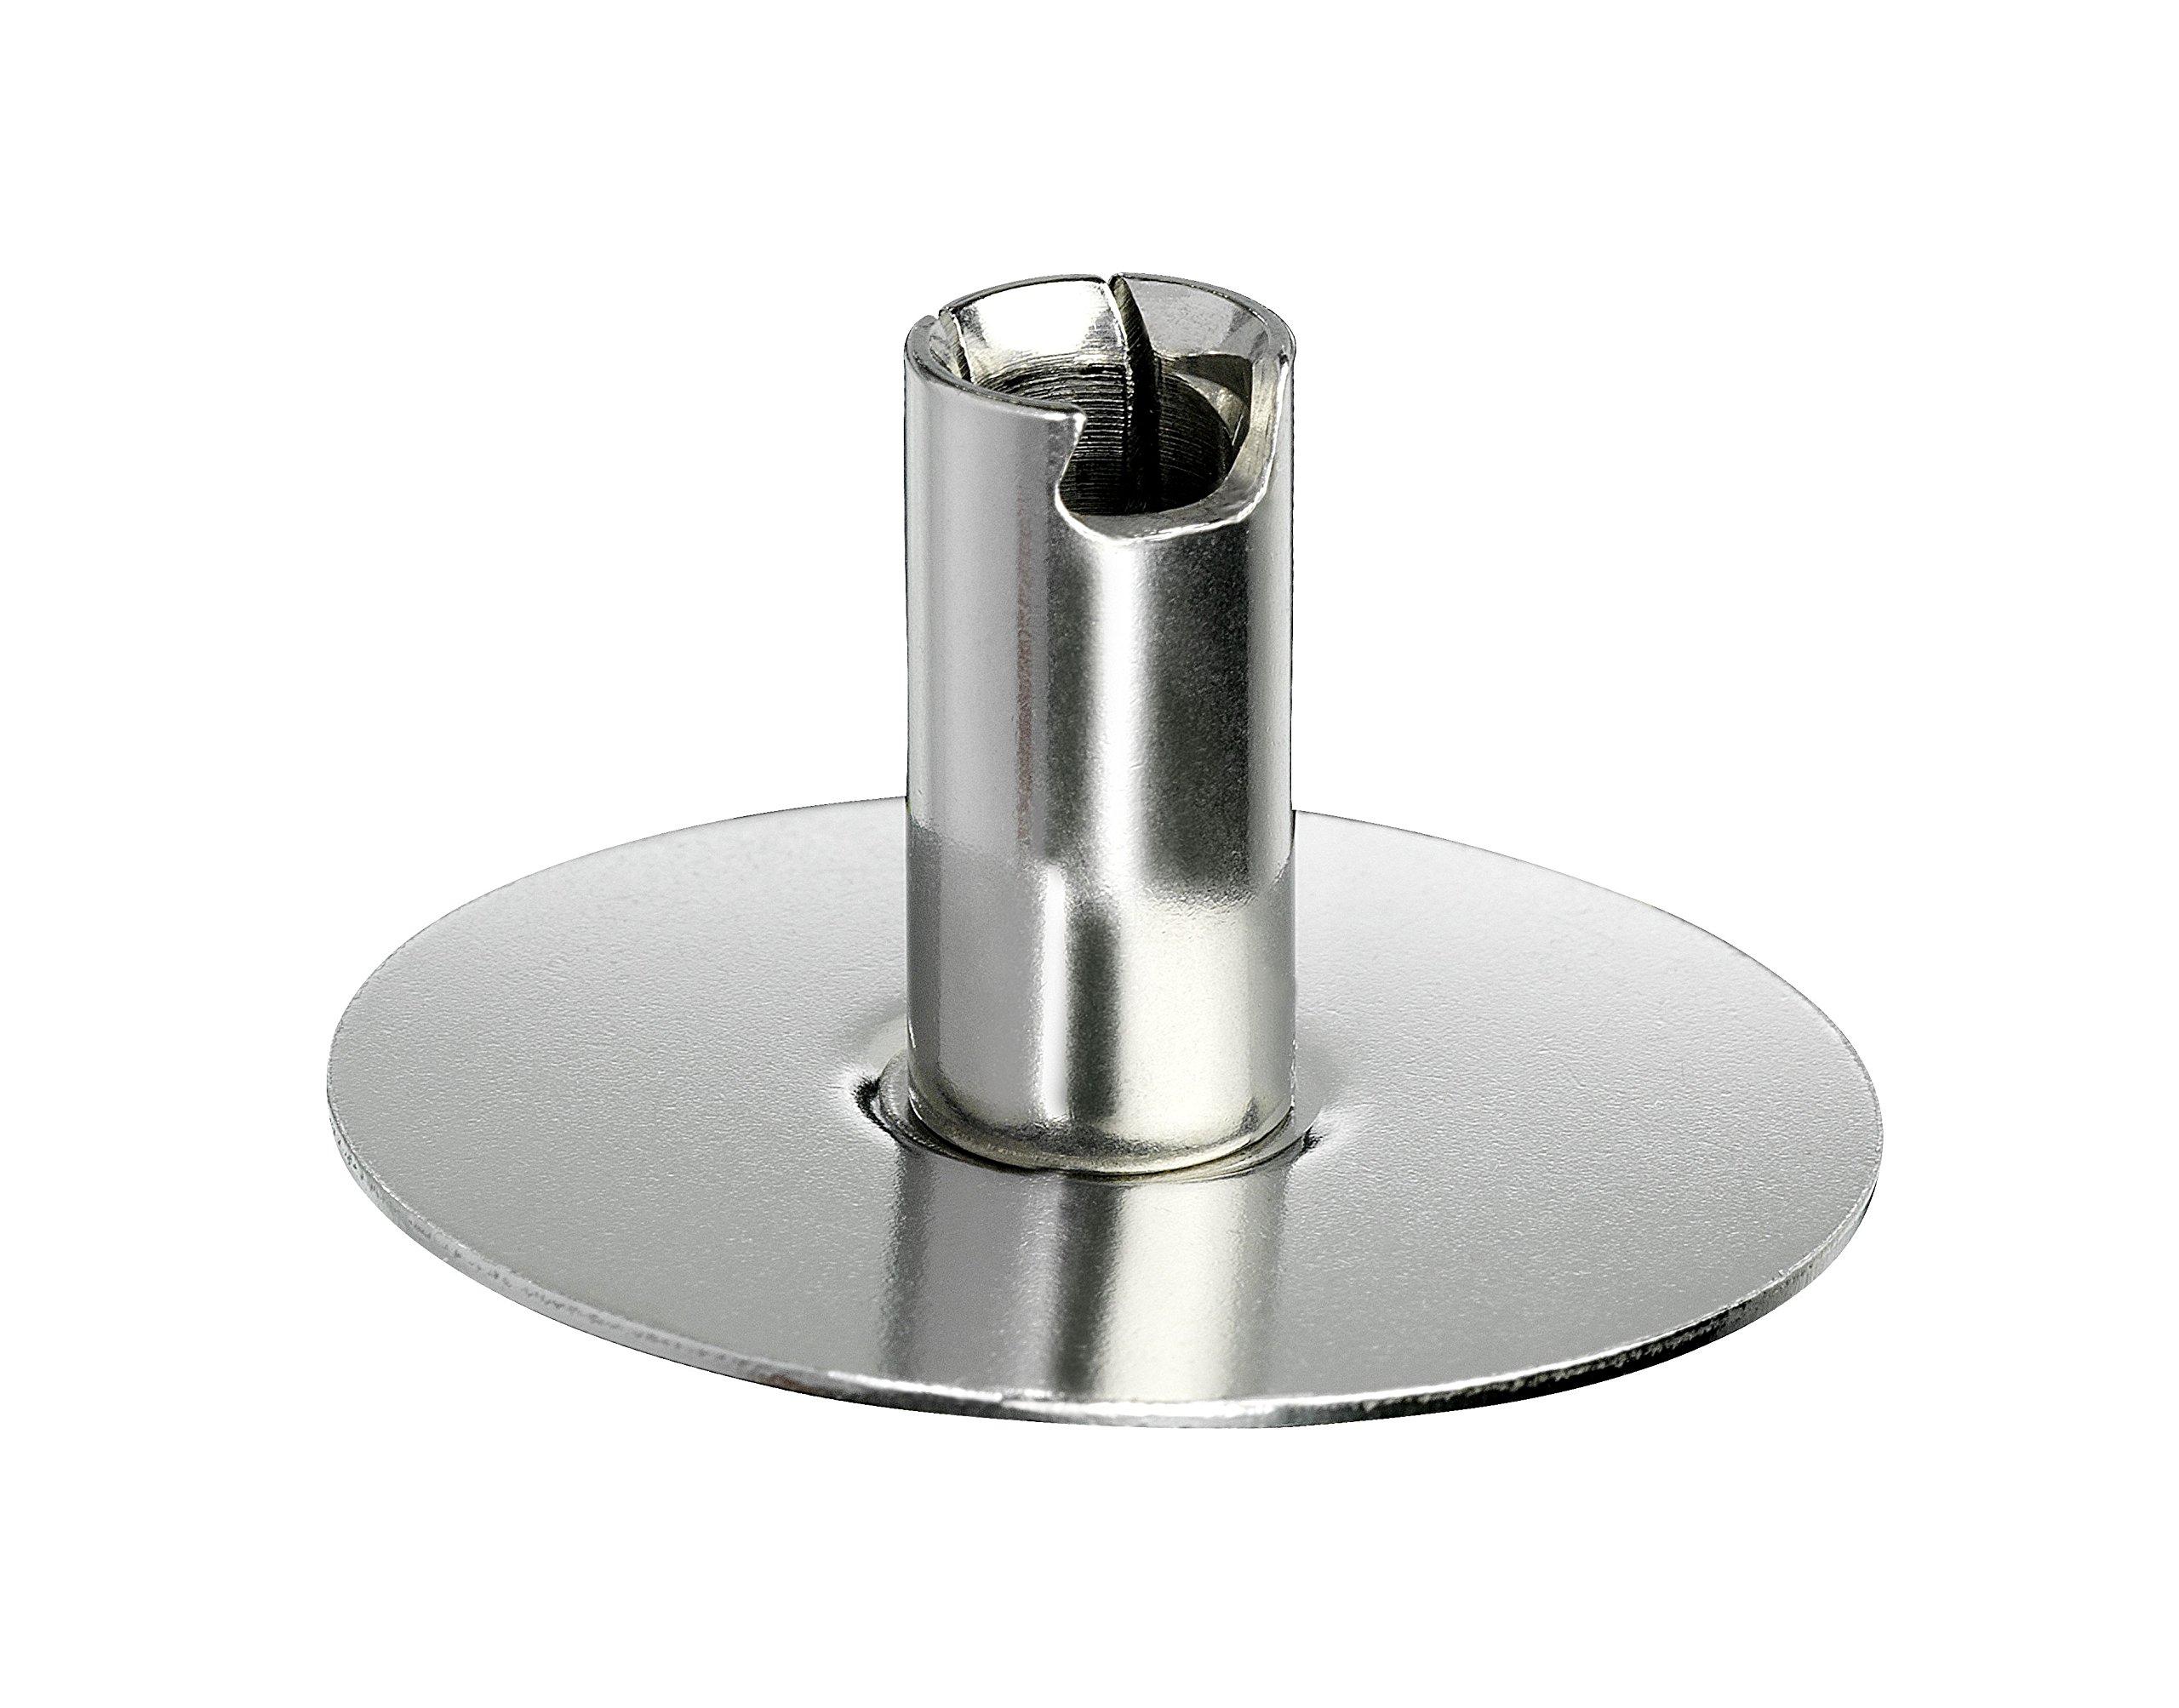 81zOMN4lmJL - bamix Deluxe Hand Held Food Processor, 180 W, Silver